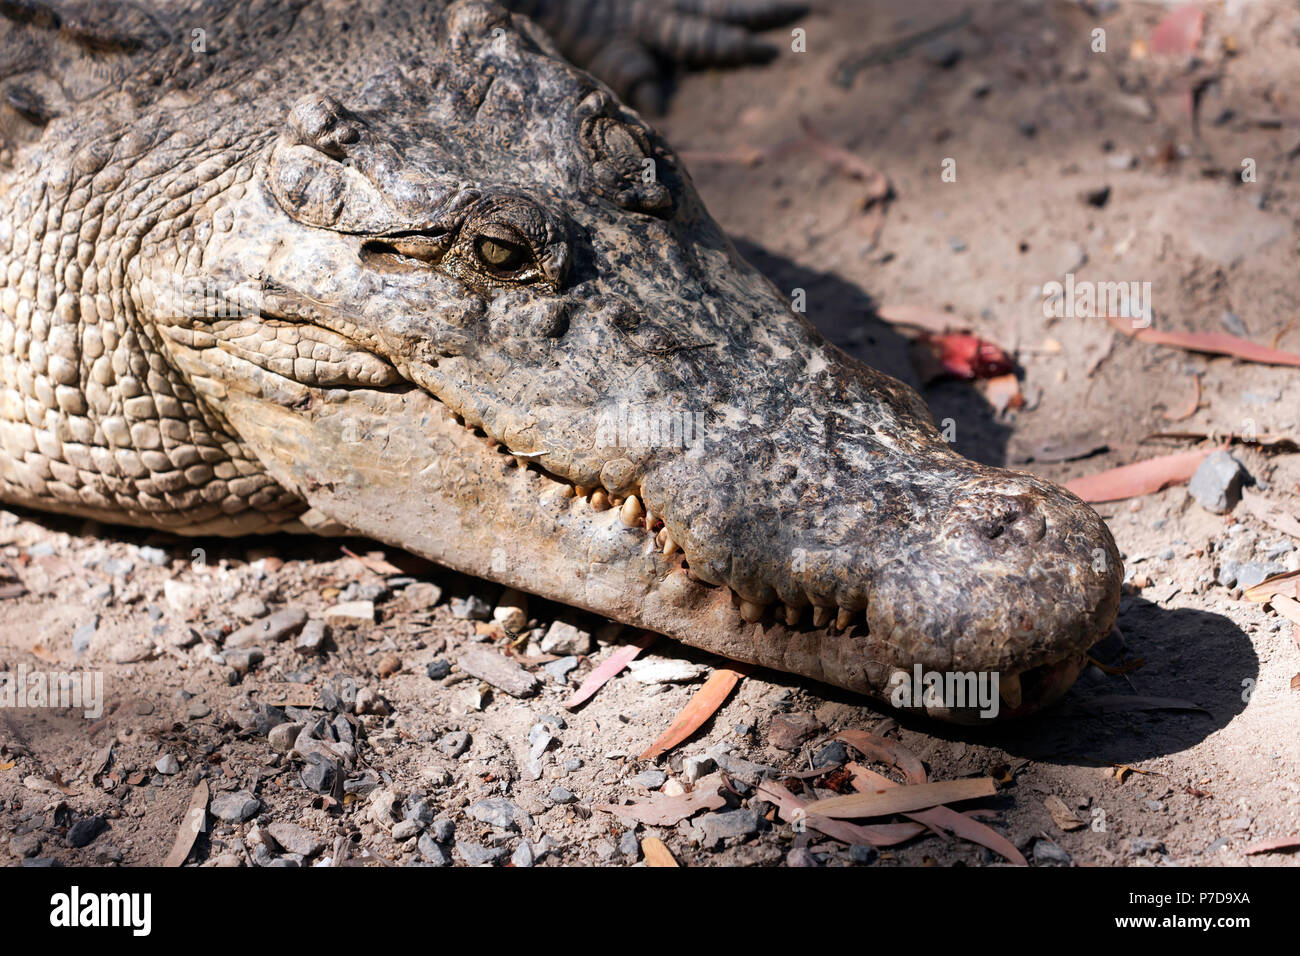 Close-up  of the head  large Estuarine  Crocodile at Hartley's Crocodile Adventures, Captain Cook Highway, Wangetti, Queensland, Australia - Stock Image